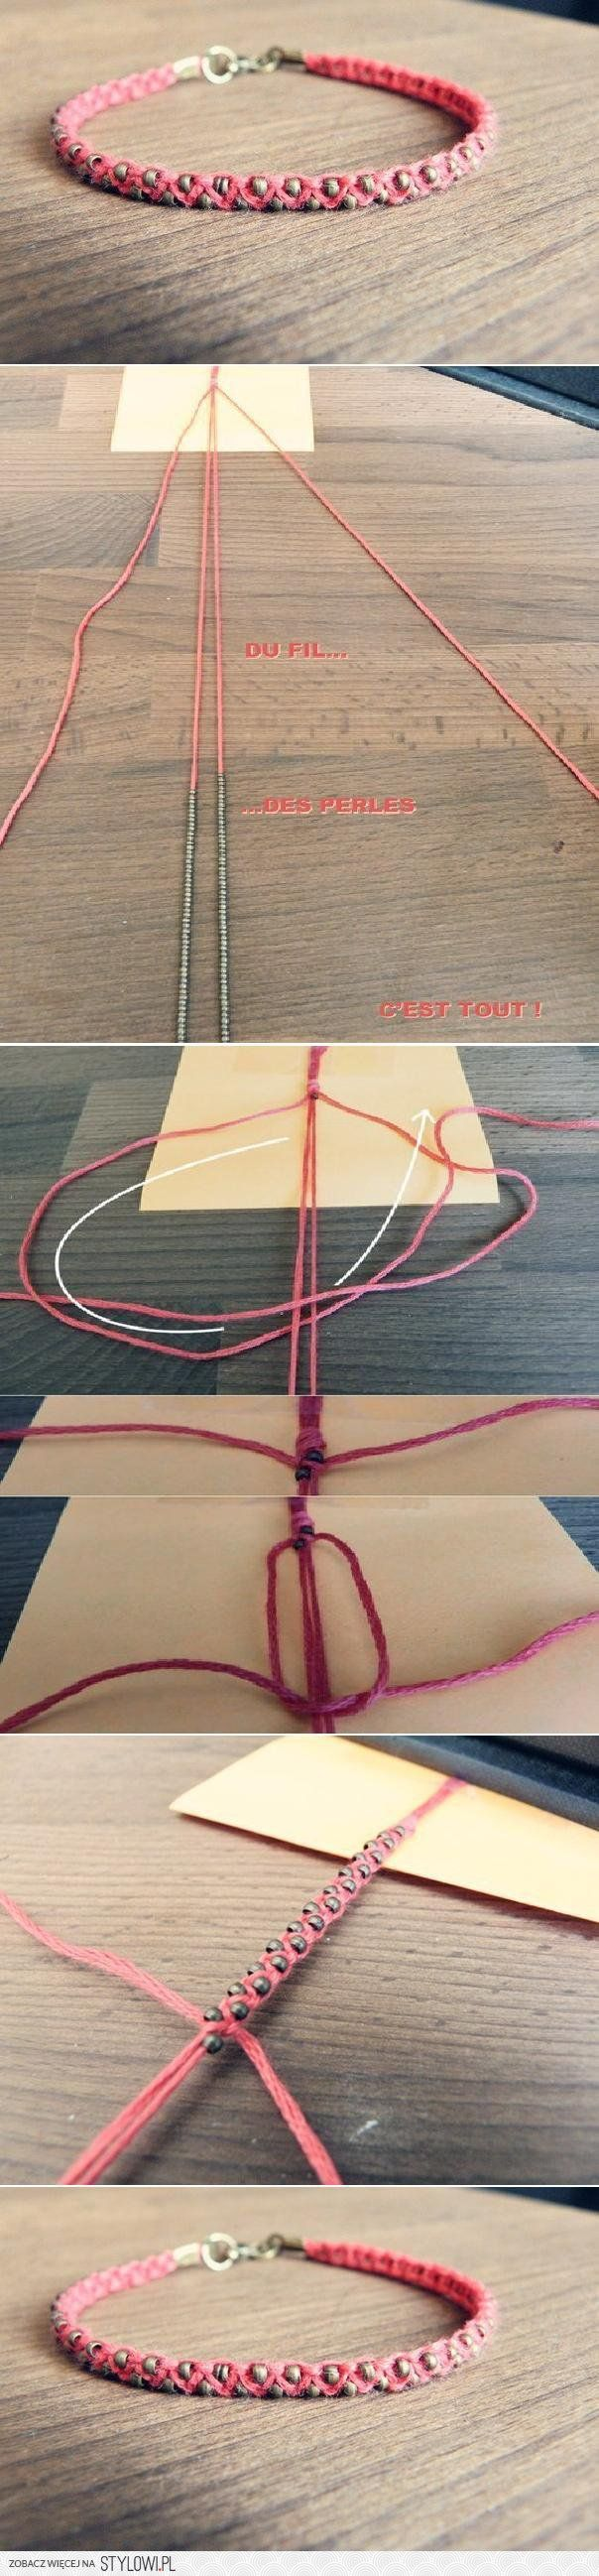 DIY Zaledwie Weave Projekty DIY Bransoletki | UsefulDIY…